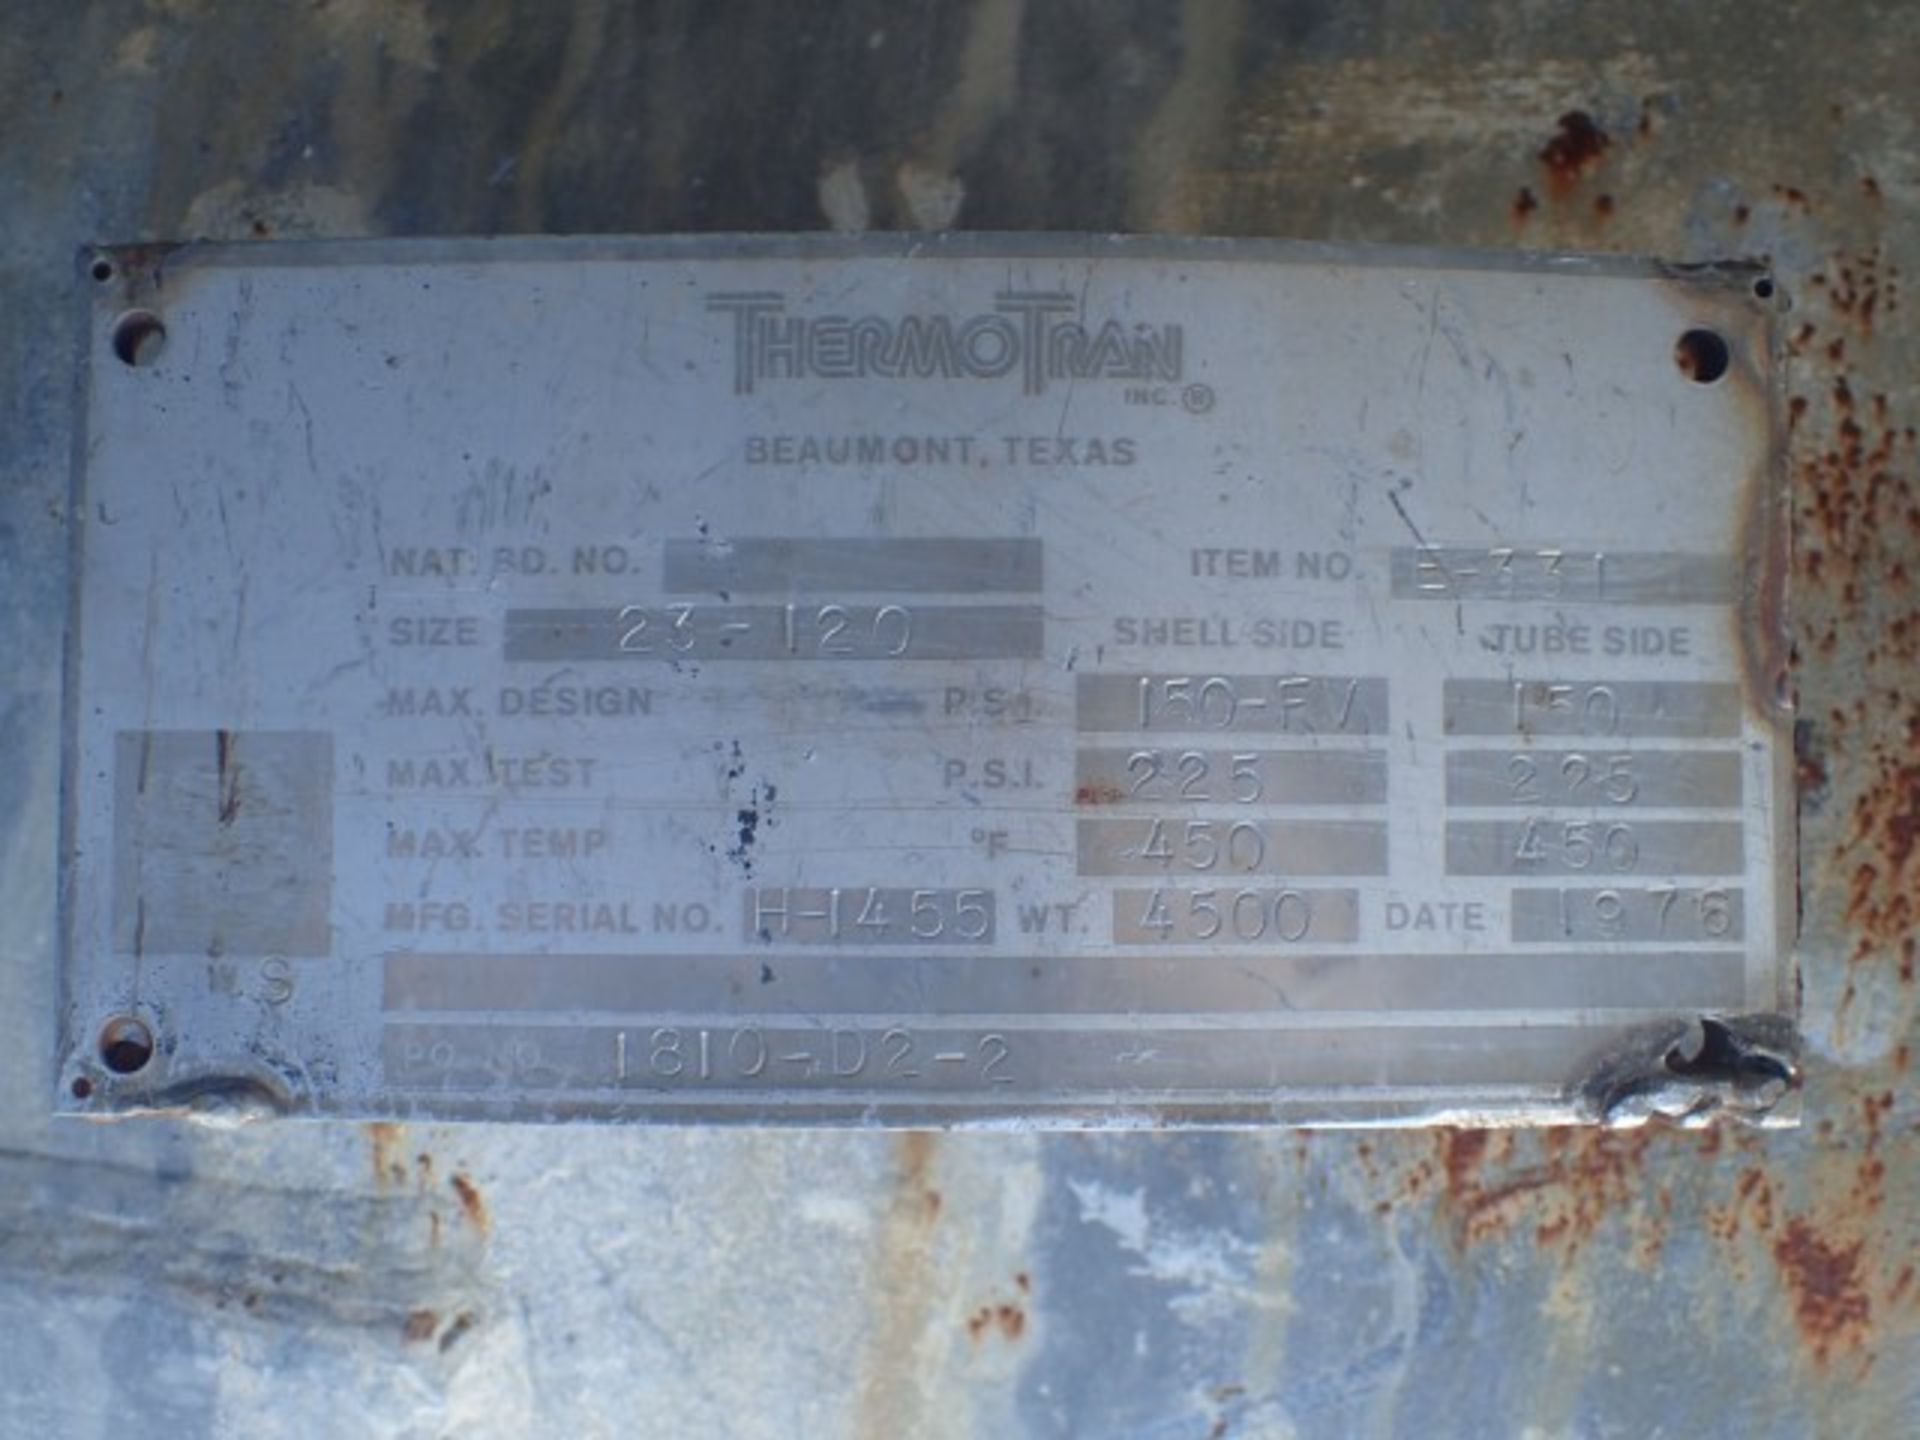 Lot 4 - 239 Sq Ft Thermotran Heat Exchanger, S/S, 150/150#